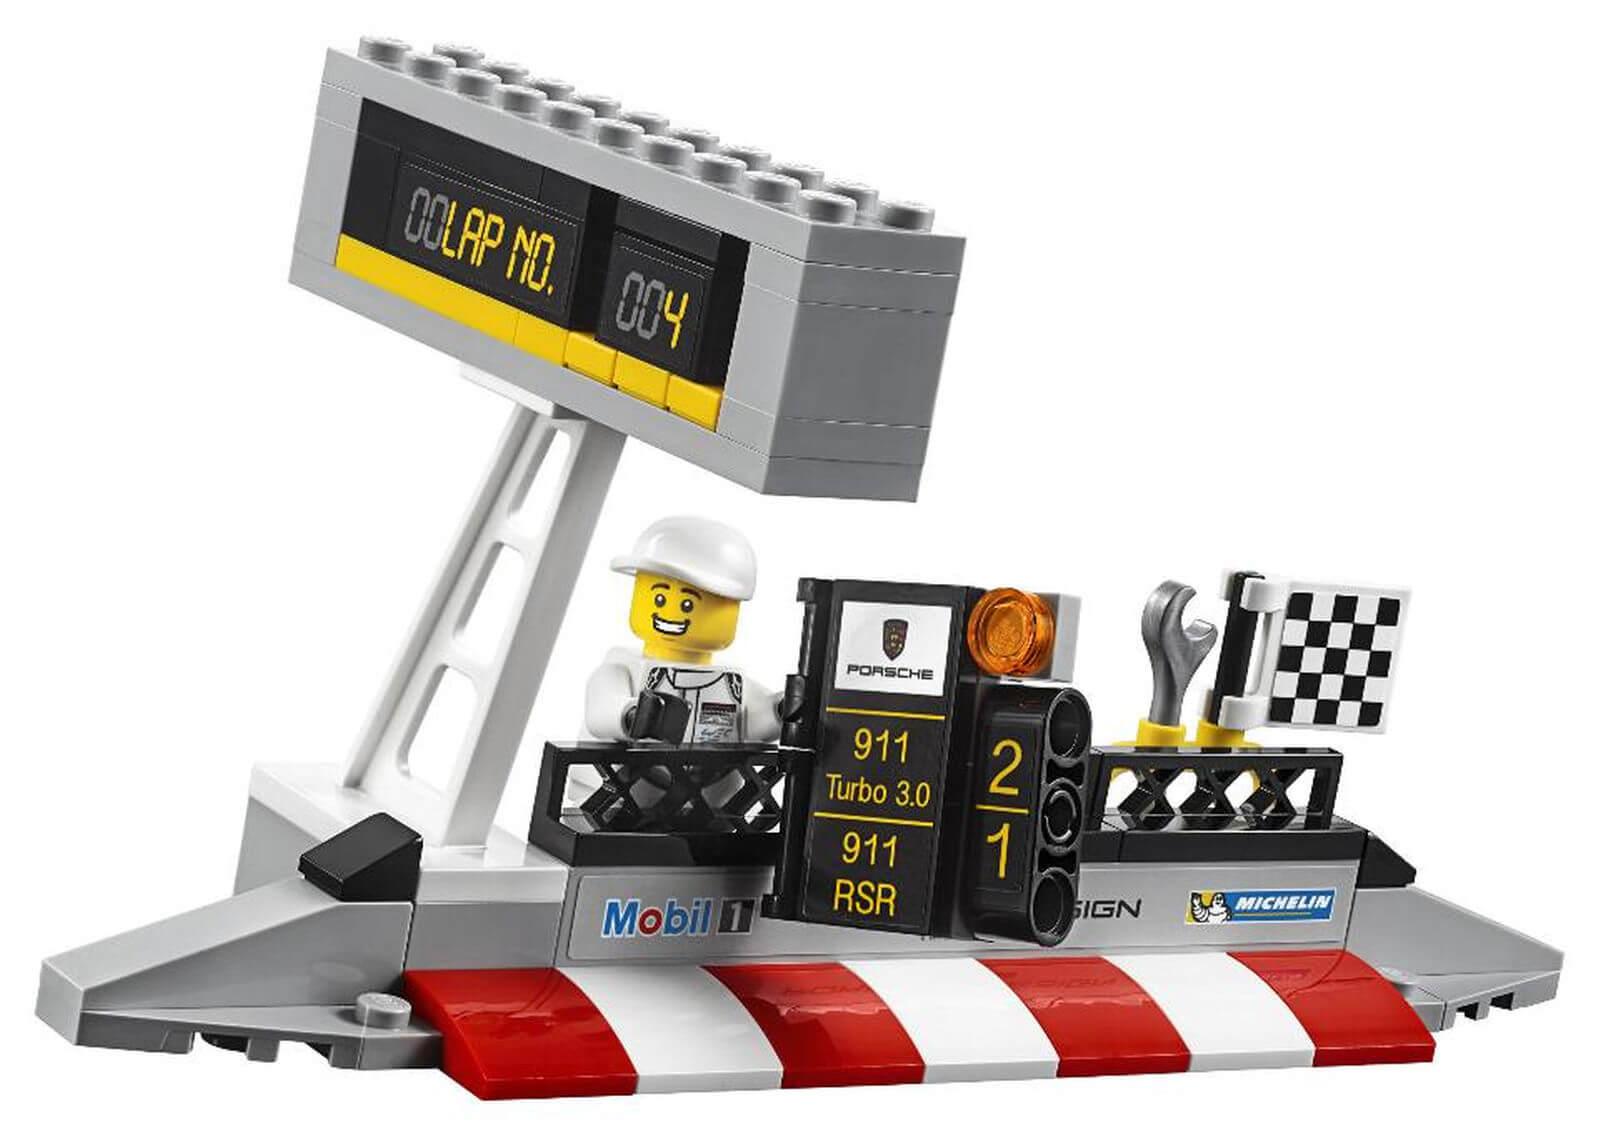 Mua đồ chơi LEGO 75888 - LEGO Speed Champion 75888 - Đội Xe Porsche 911 RSR và 911 Turbo 3.0 (LEGO Speed Champion 75888 Porsche 911 RSR and 911 Turbo 3.0)